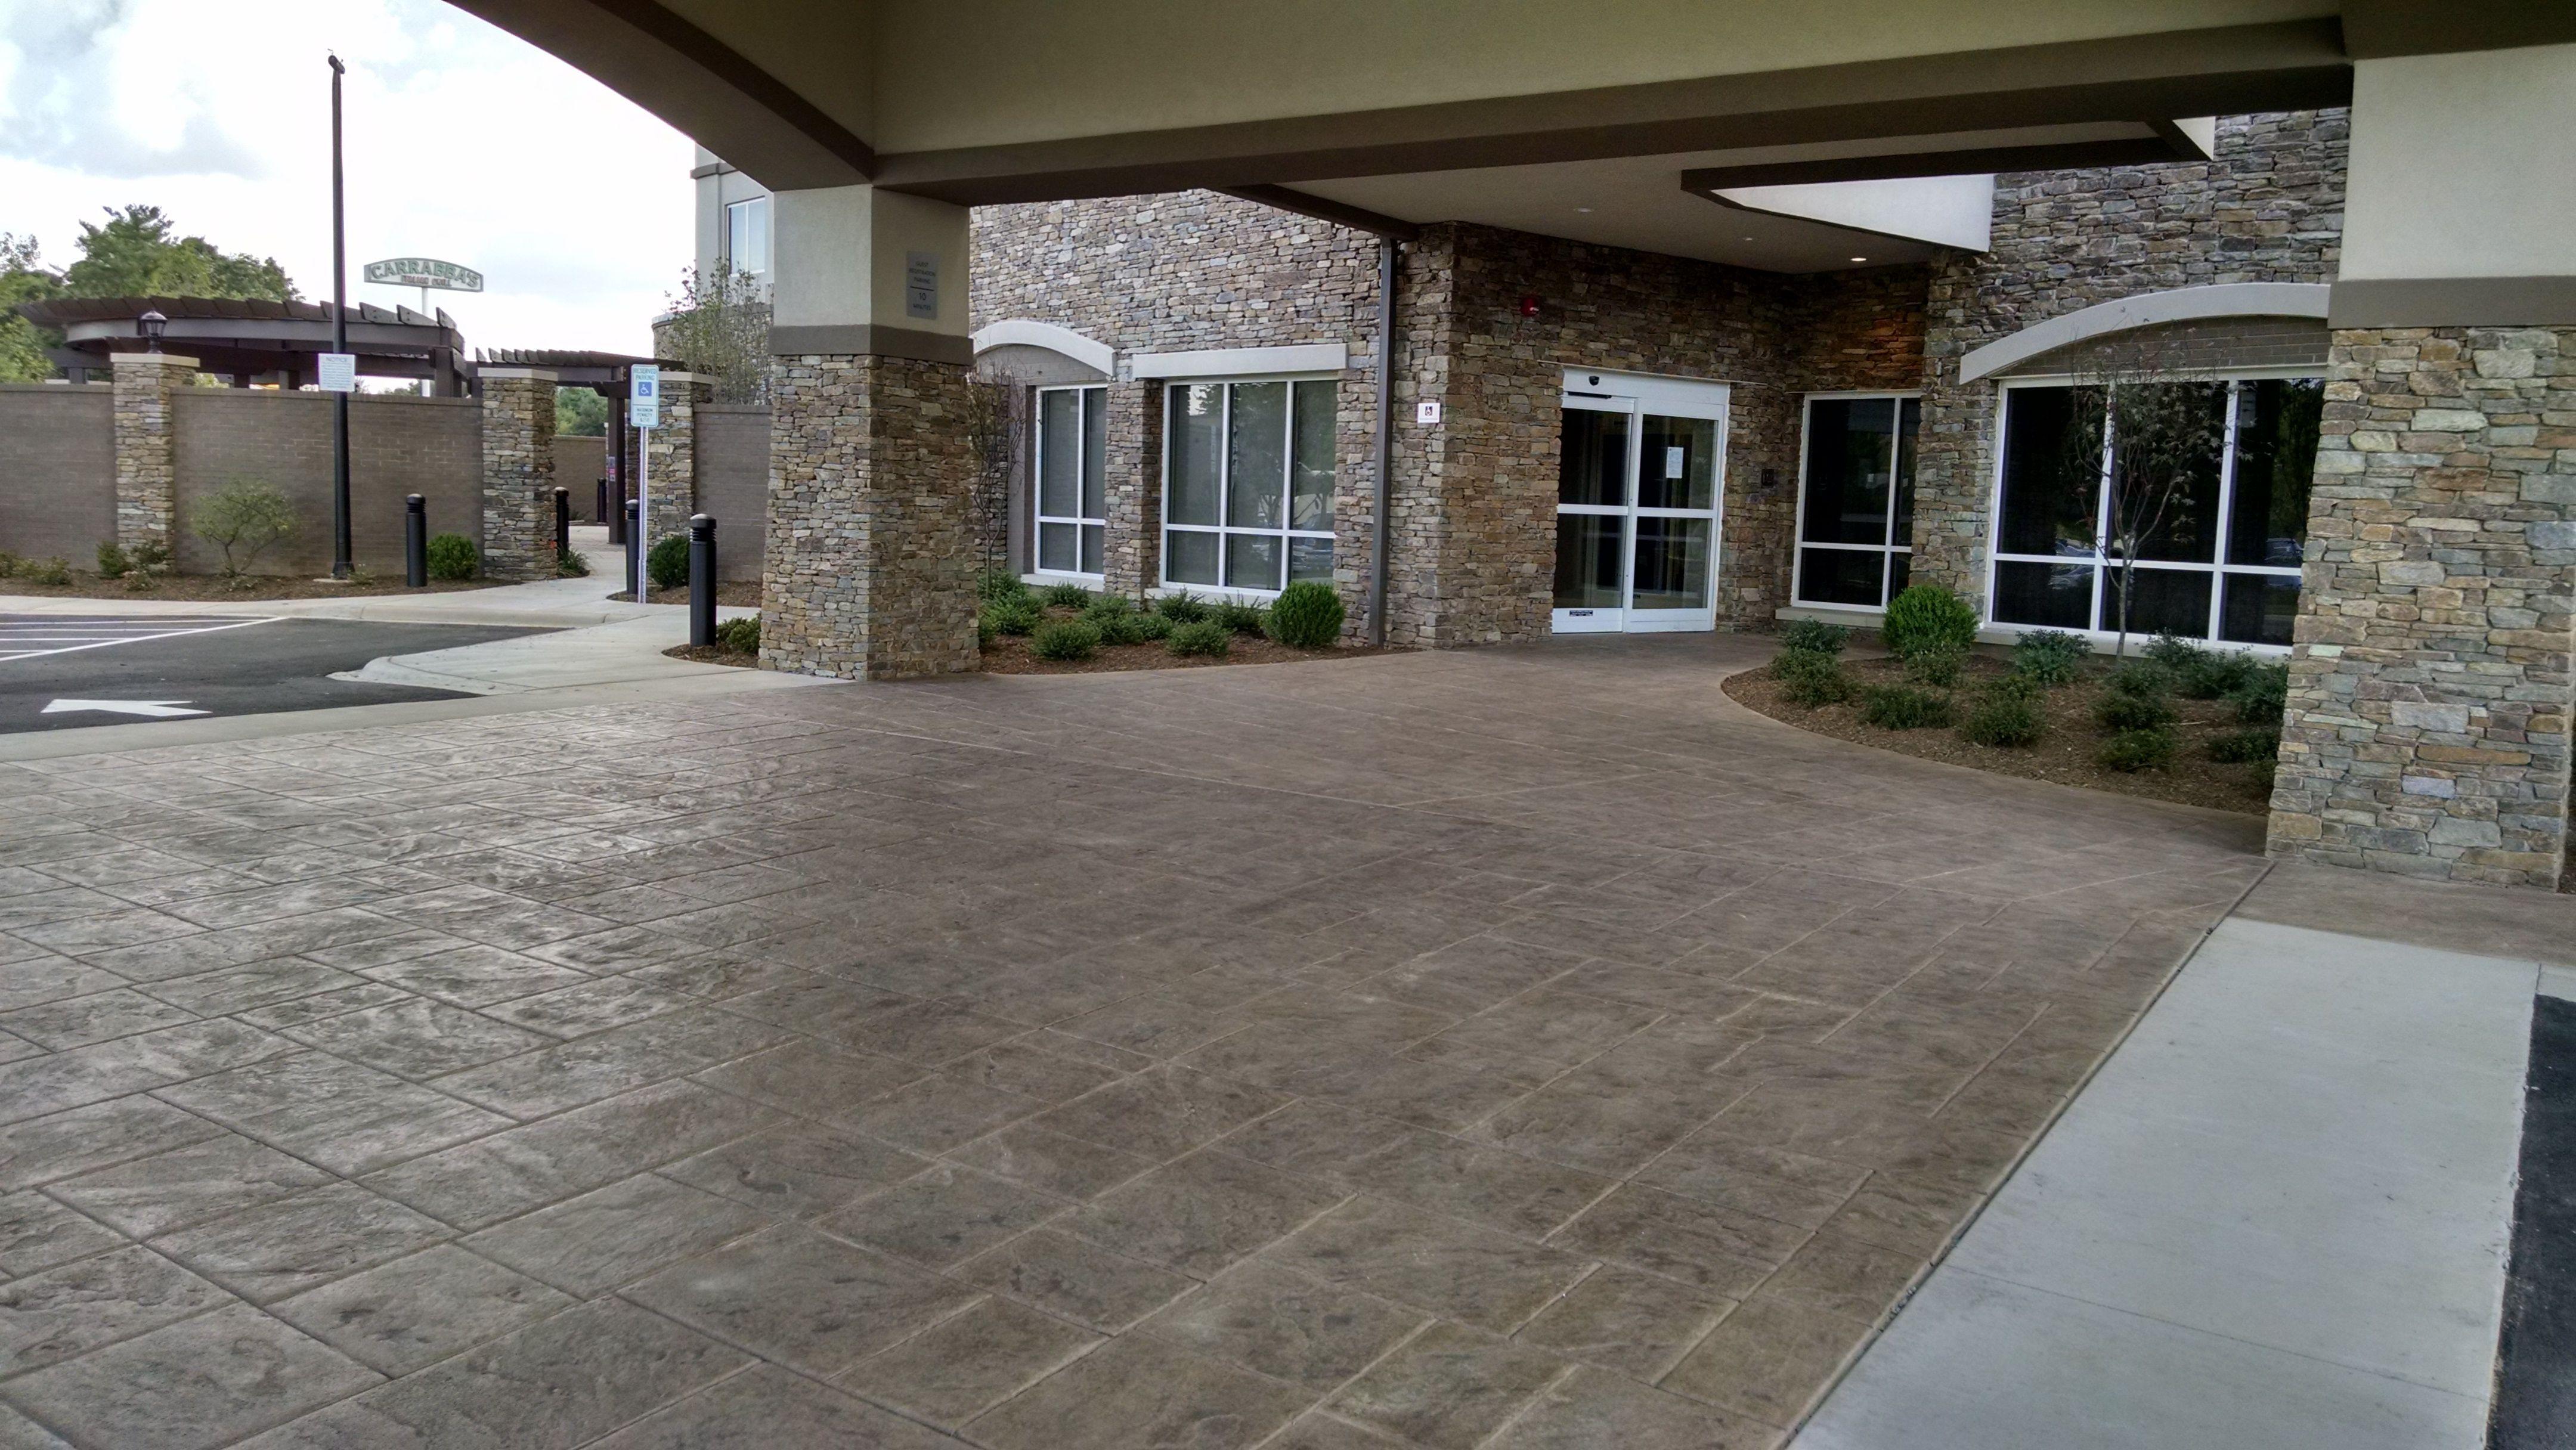 Carolina Bomanite Used The Bomanite Bomacron English Sidewalk Slate Pattern And Bomacron Slate Texture To Create A Decorative Co Entryway Patios Concrete Decor